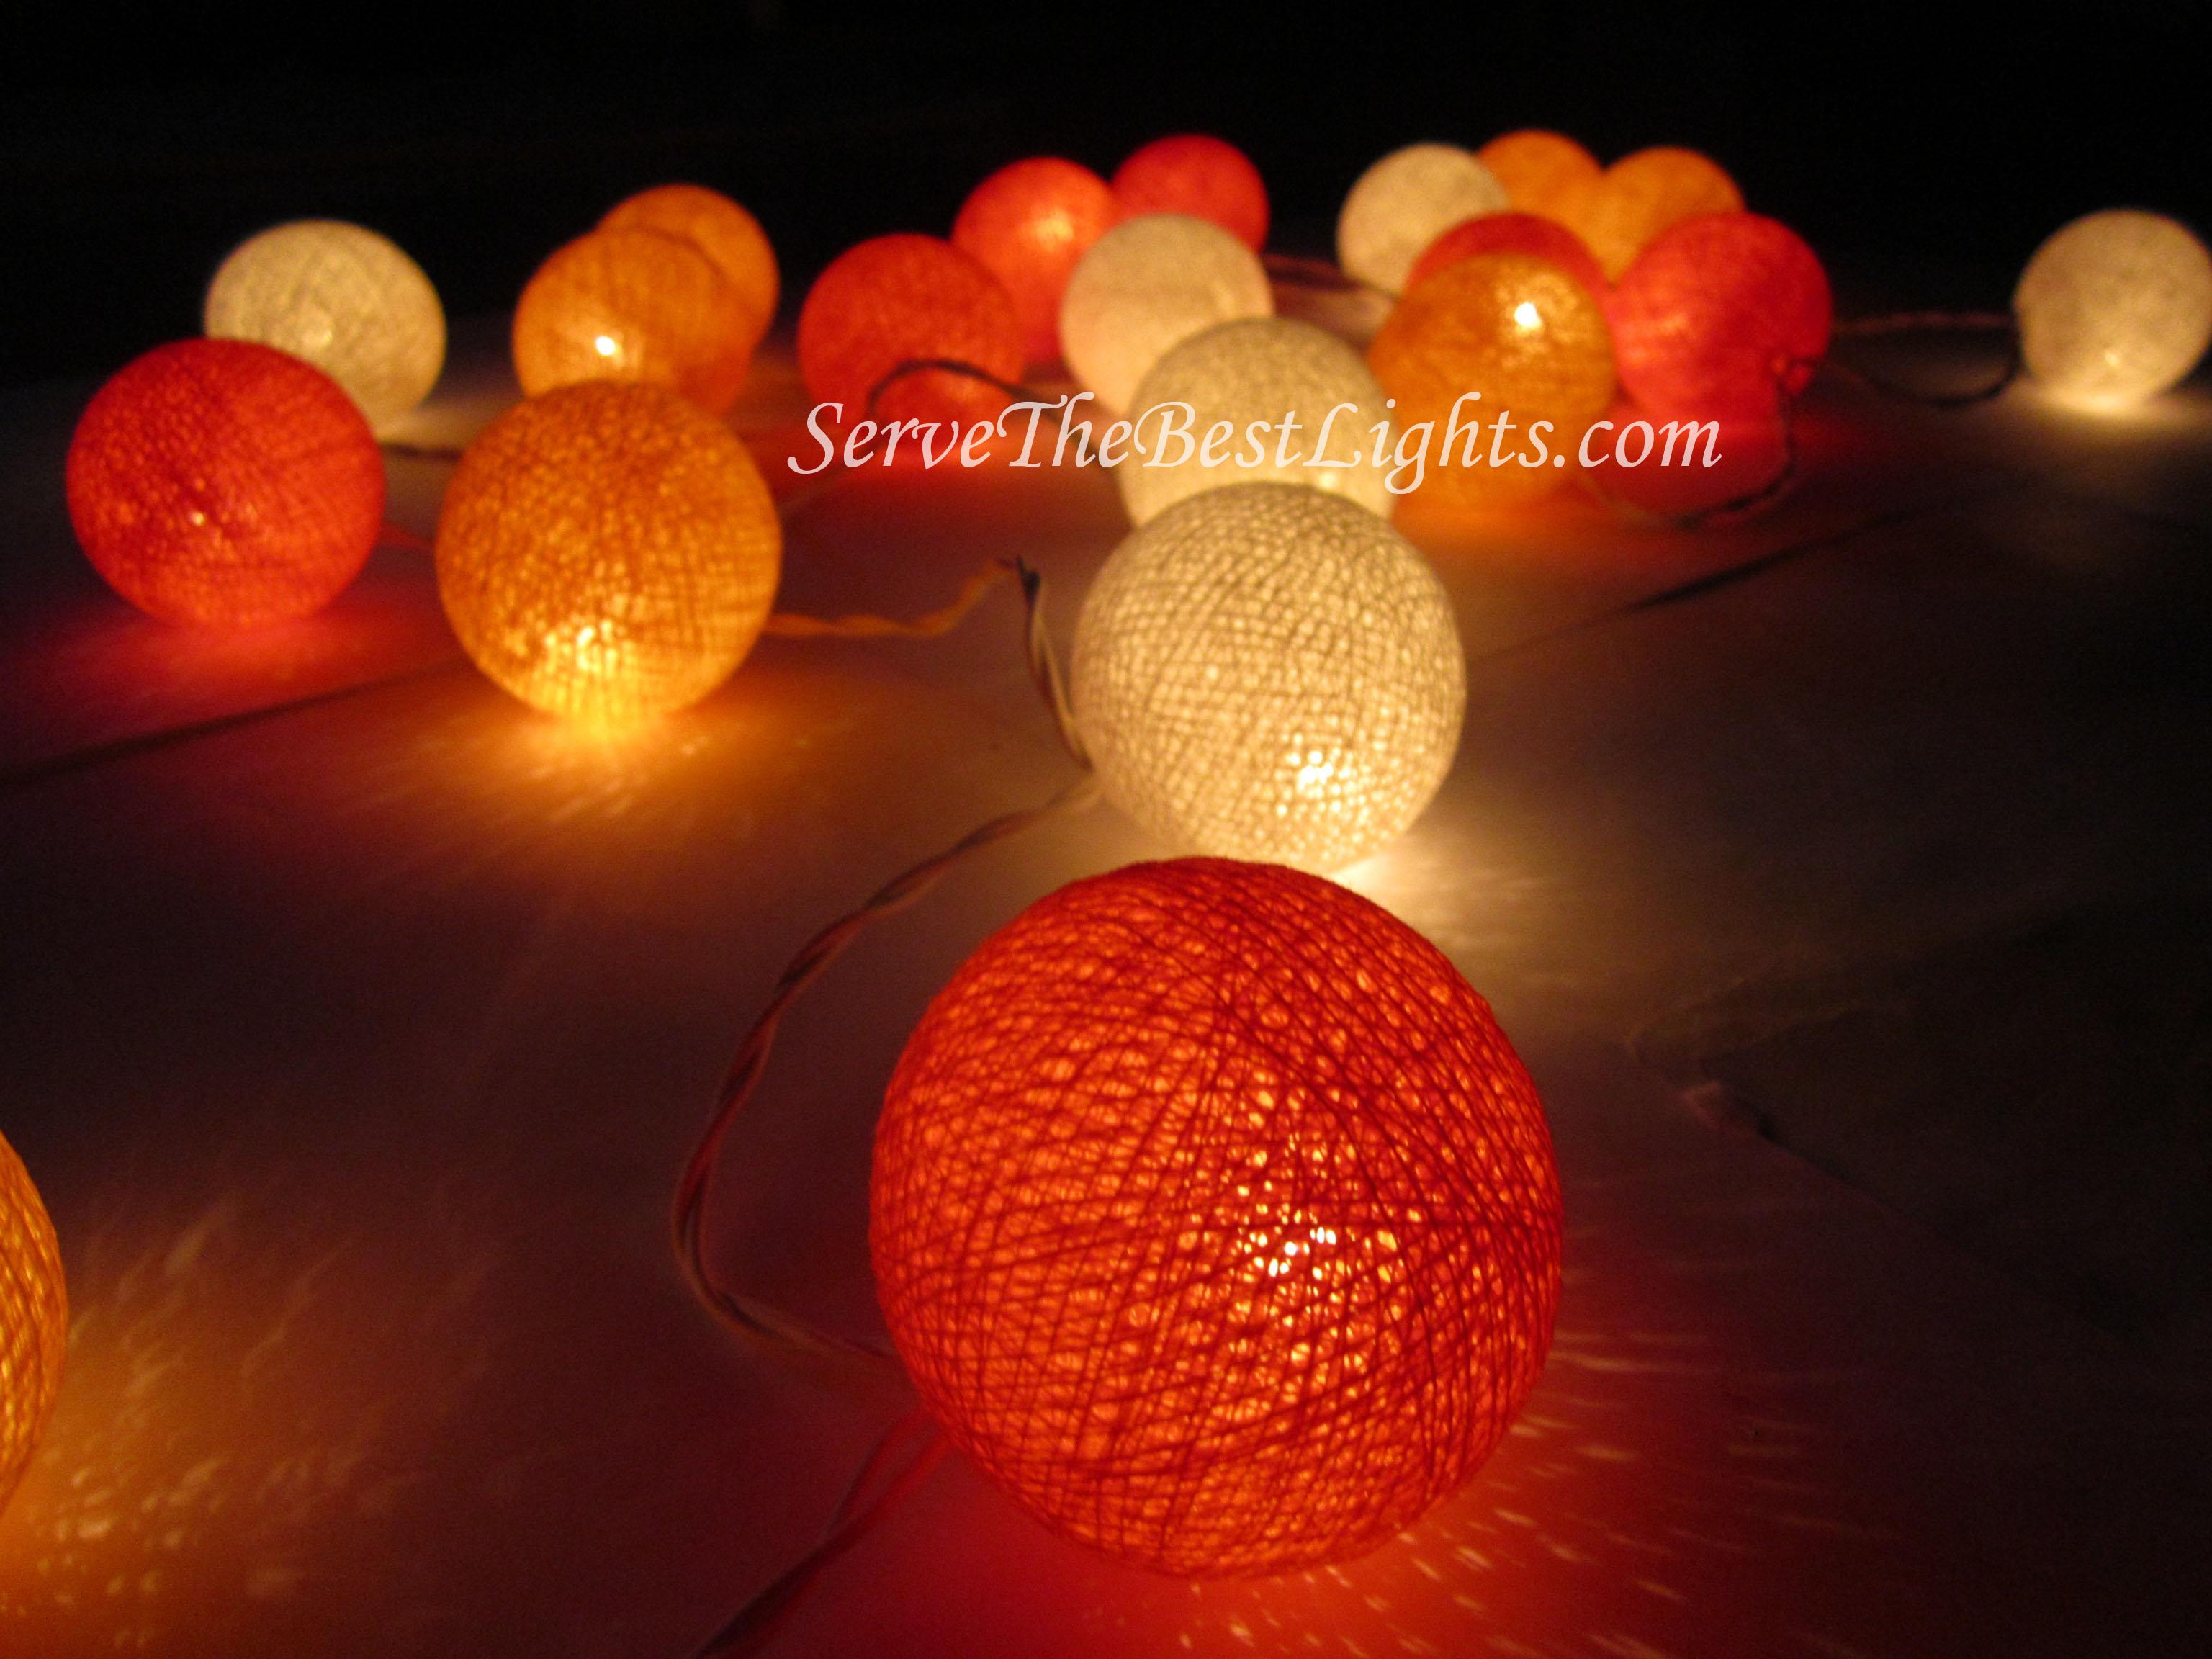 Orange Amp White Servethebestlights